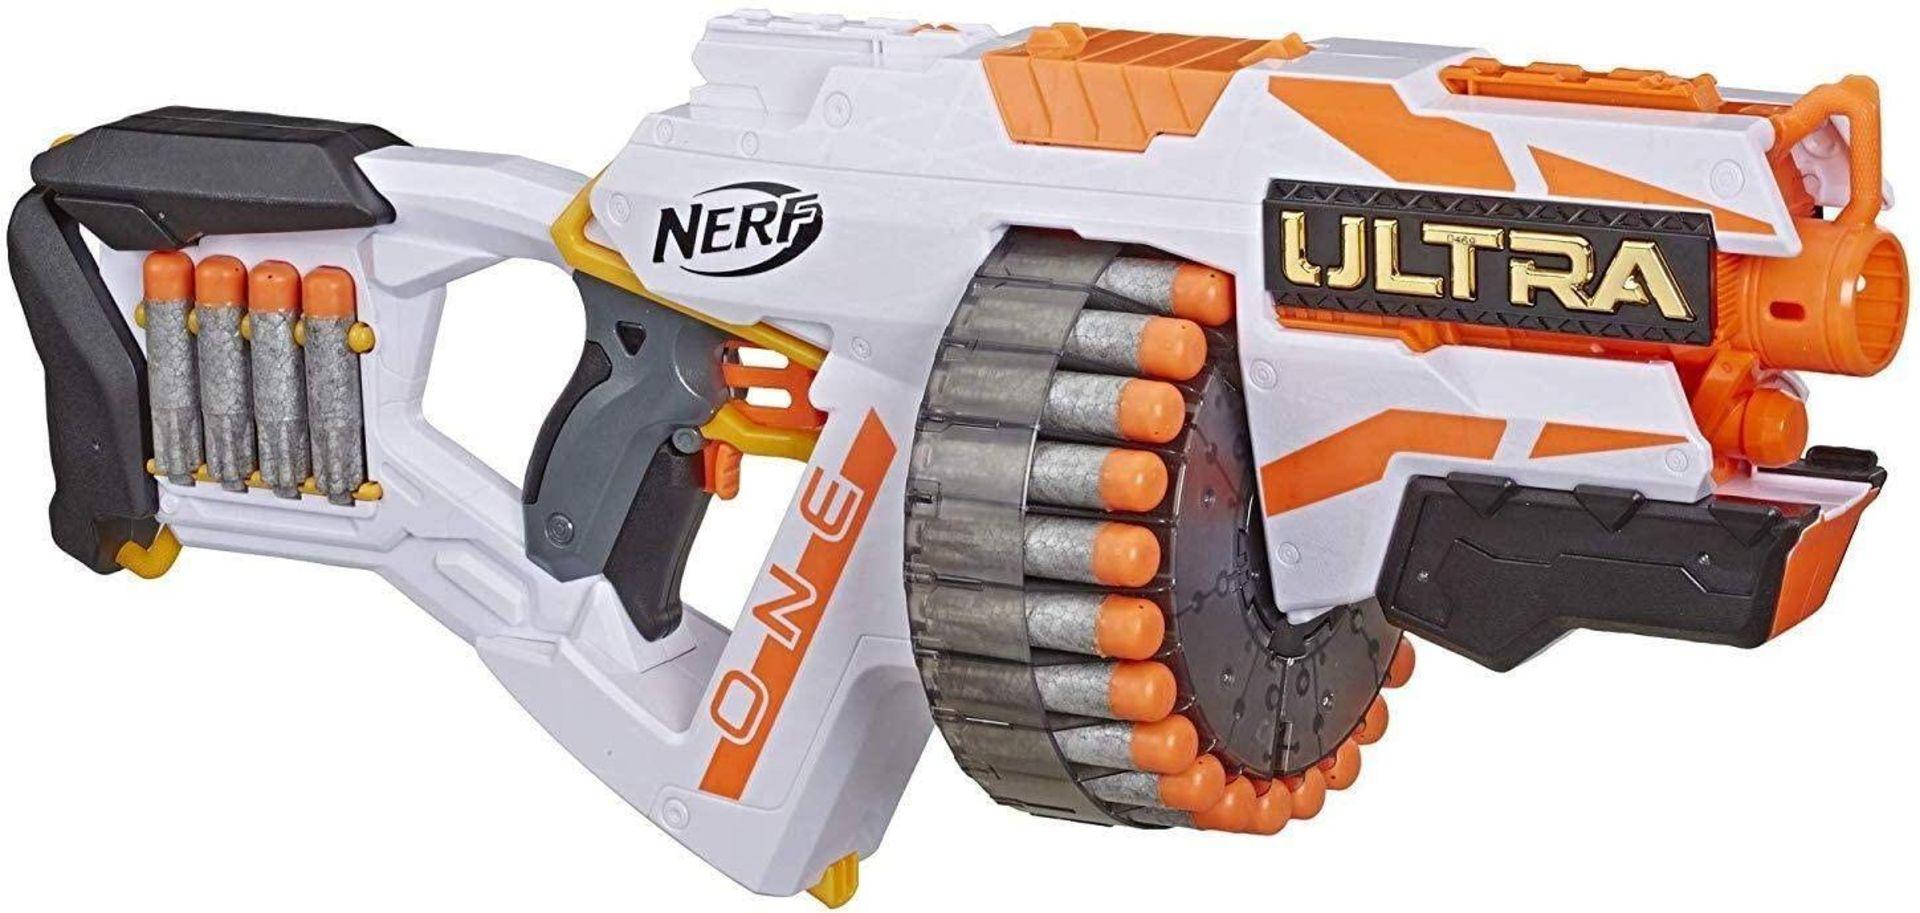 Nerf Ultra One Motorised Blaster, £50.00 RRP